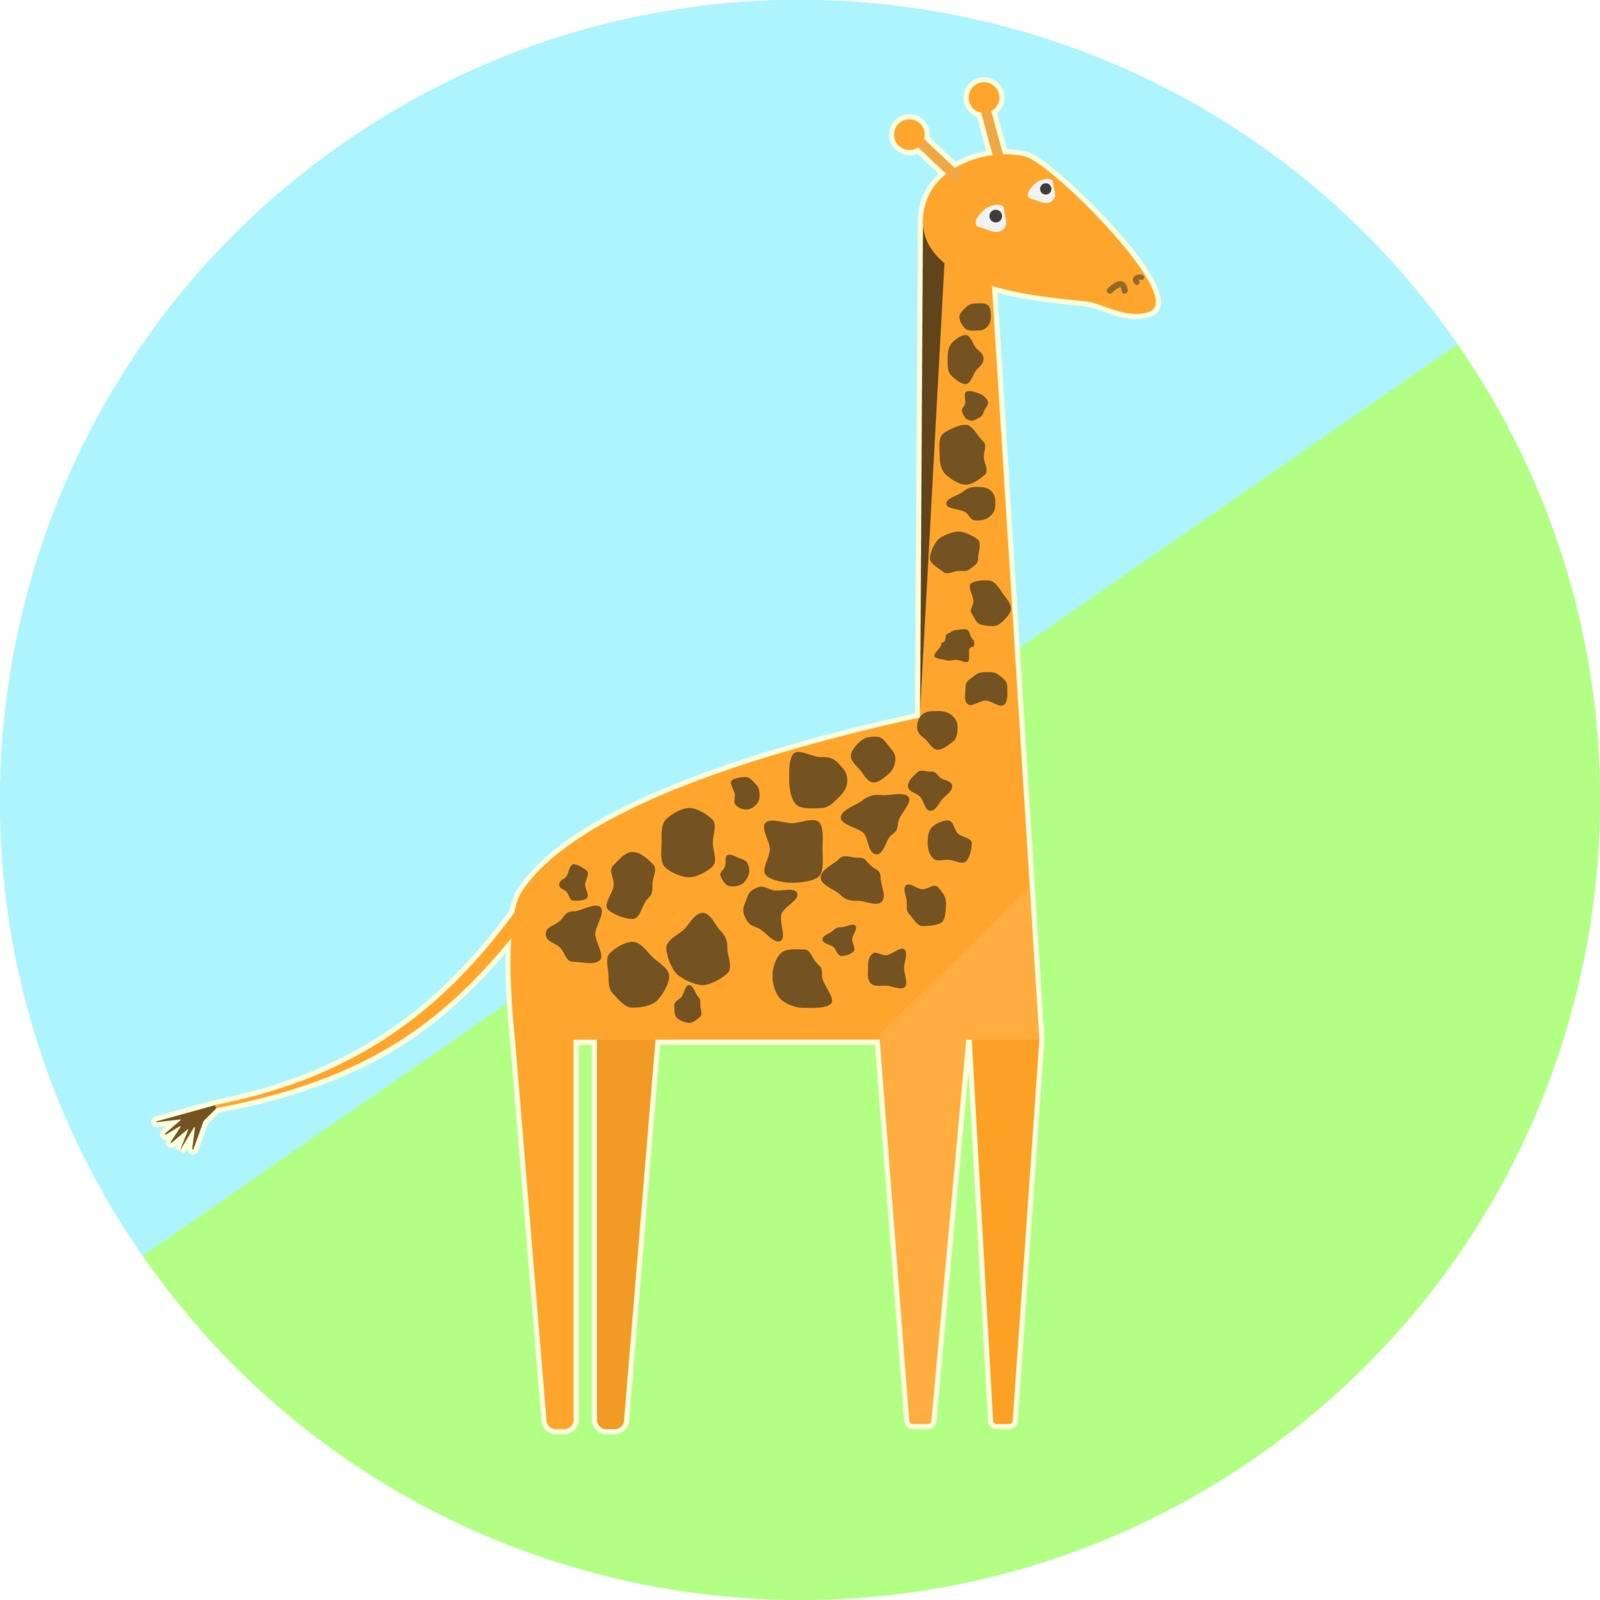 Cartoon colorful giraffe icon, nice simple animal icon, high orange giraffe with brown spots